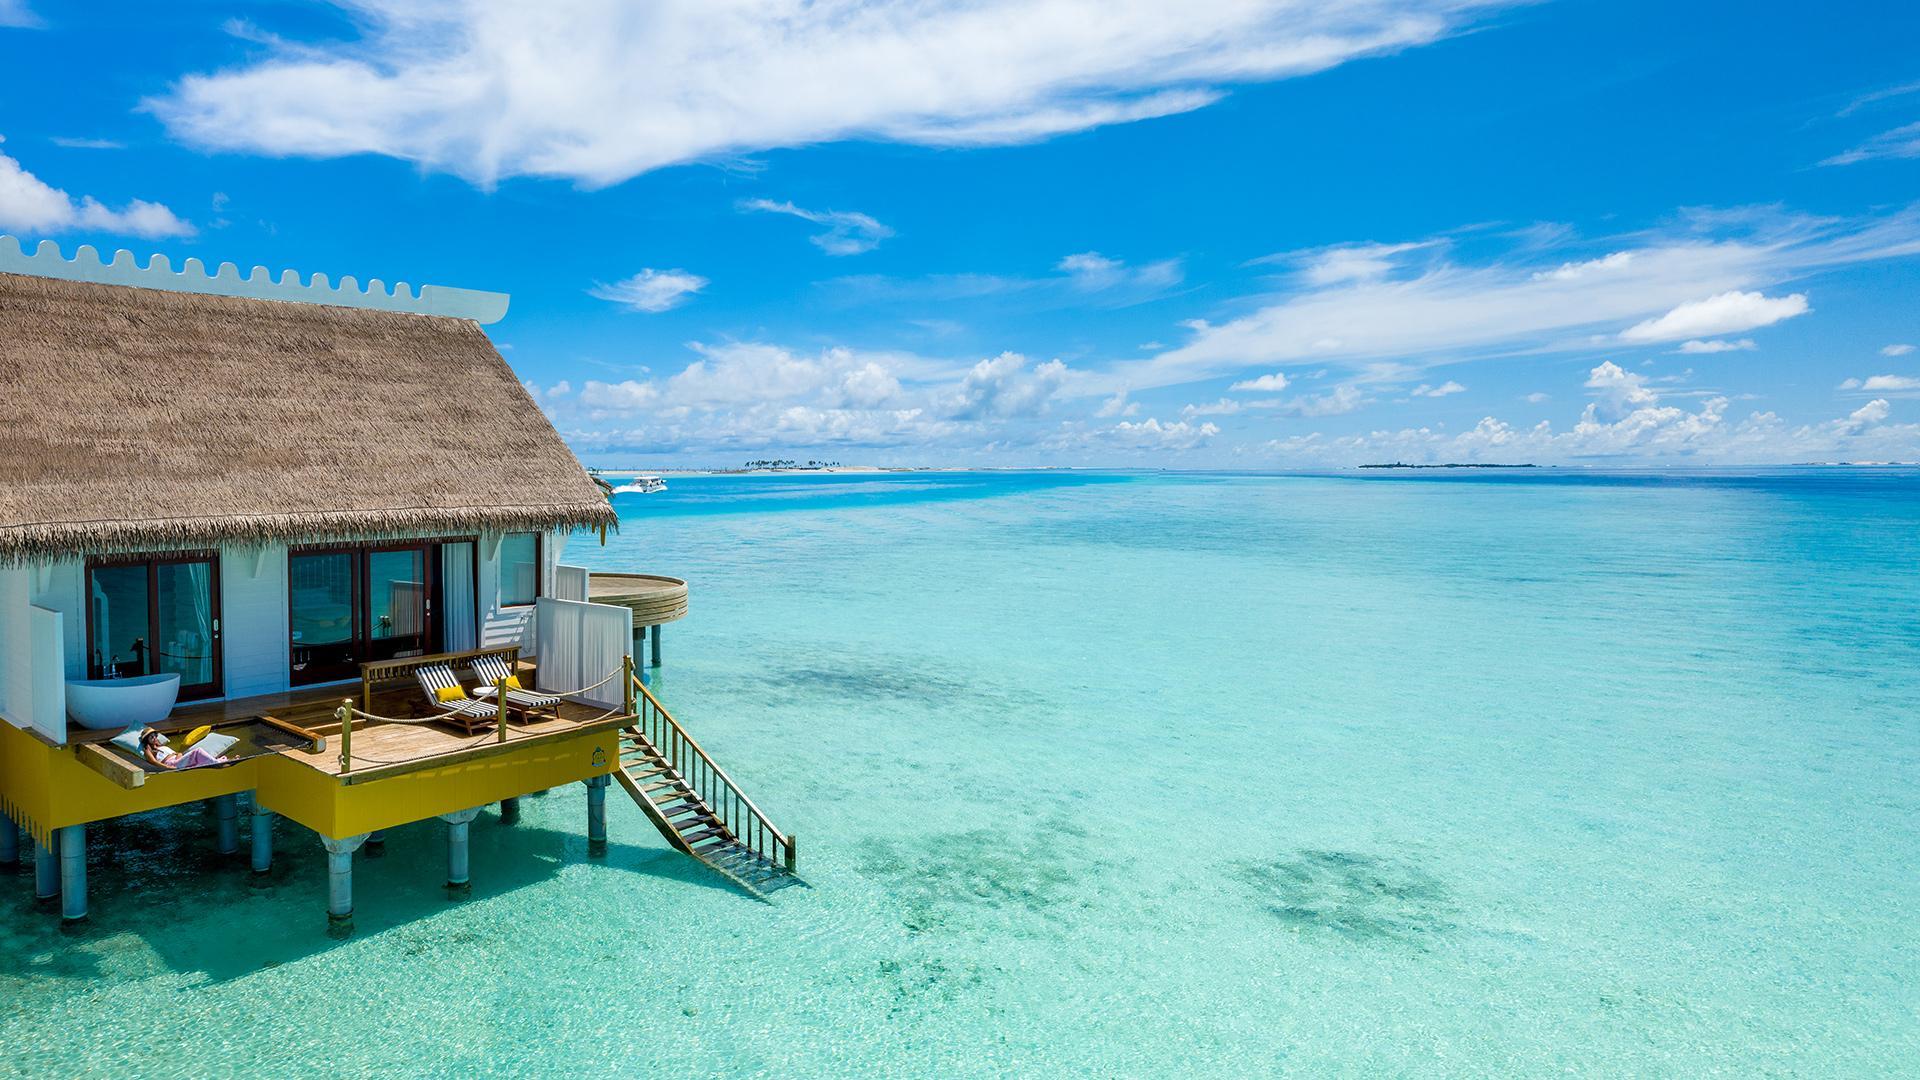 Overwater Villa OCT2020 image 1 at SAii Lagoon Maldives, Curio Collection by Hilton  by Kaafu Atoll, North Central Province, Maldives